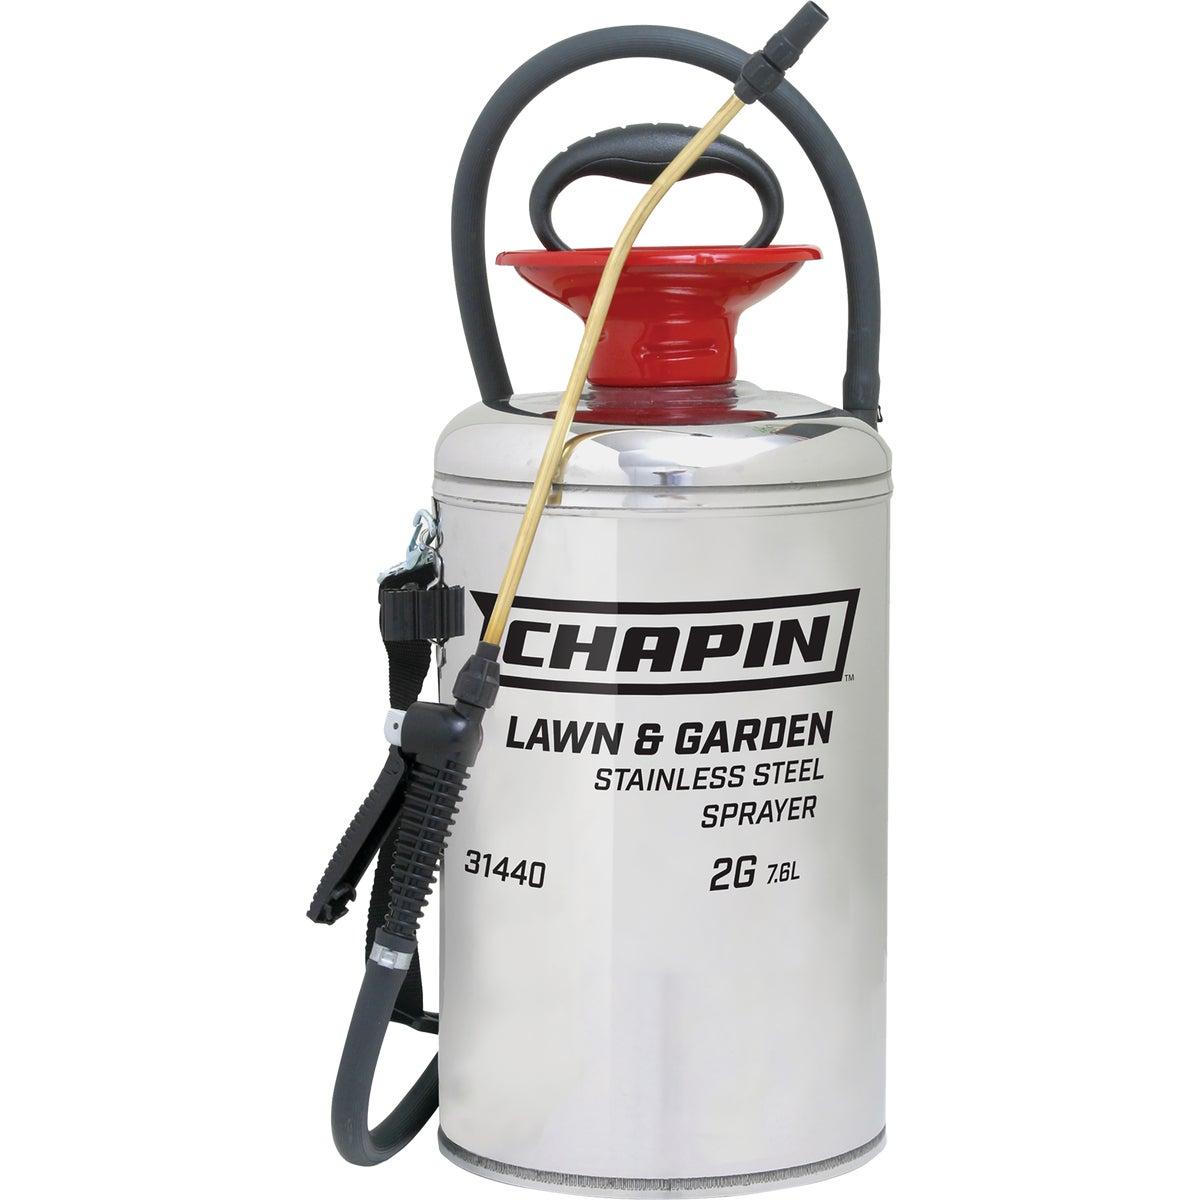 Chapin 31440 2-Gallon Lawn & Garden Series Stainless Steel Sprayer